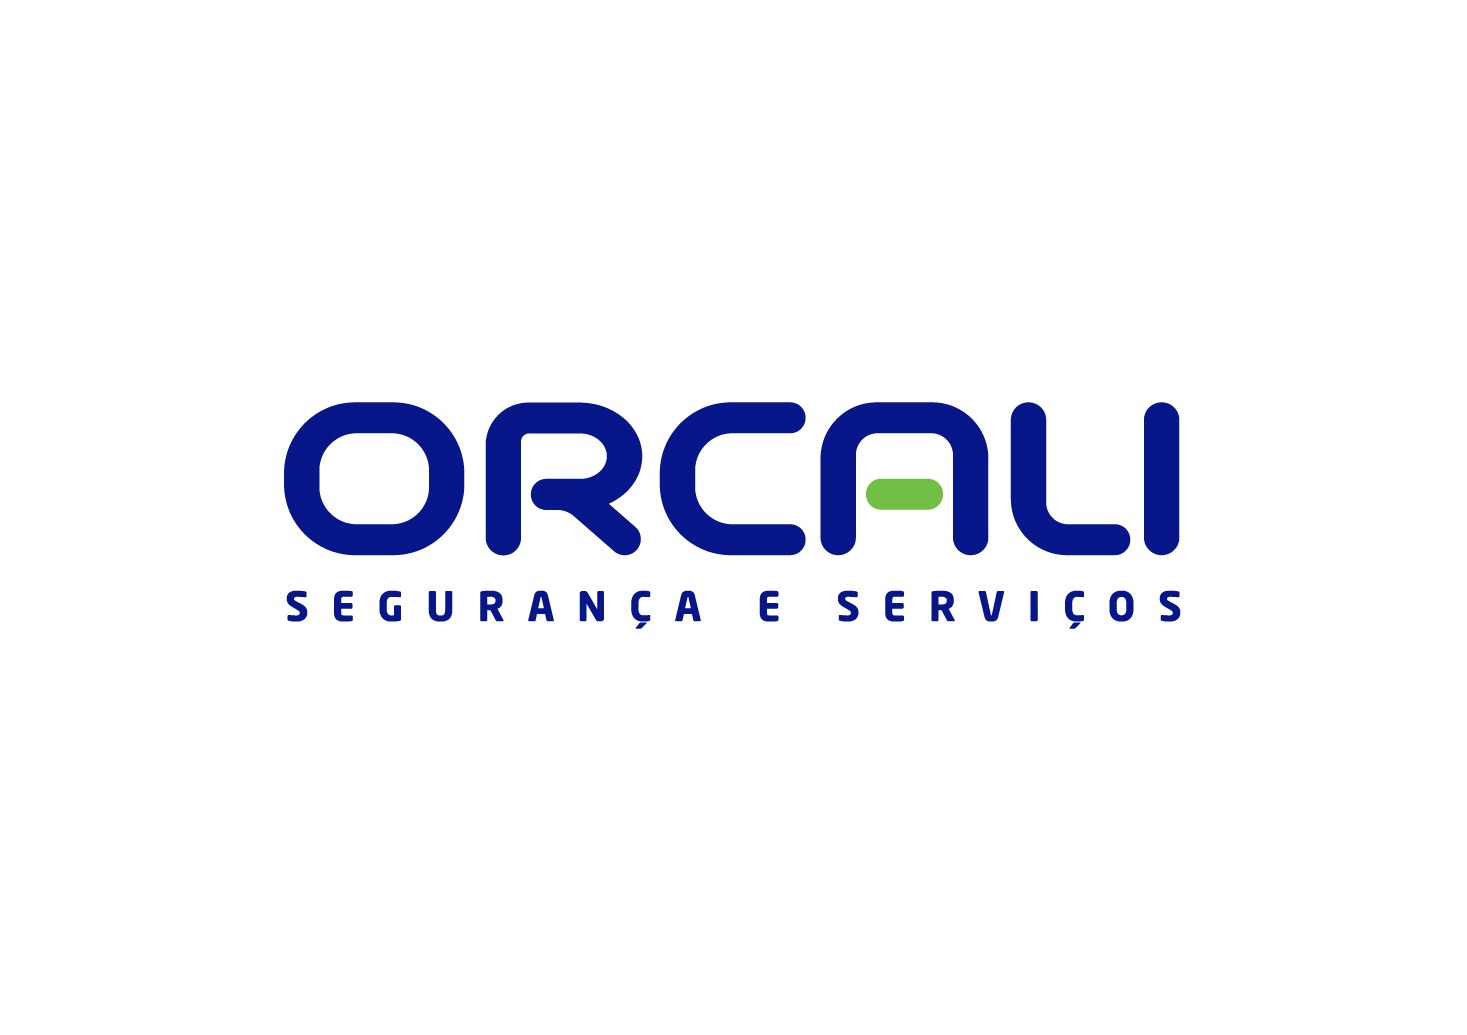 Logotipo AAAI ORCALI Segurança e Serviços